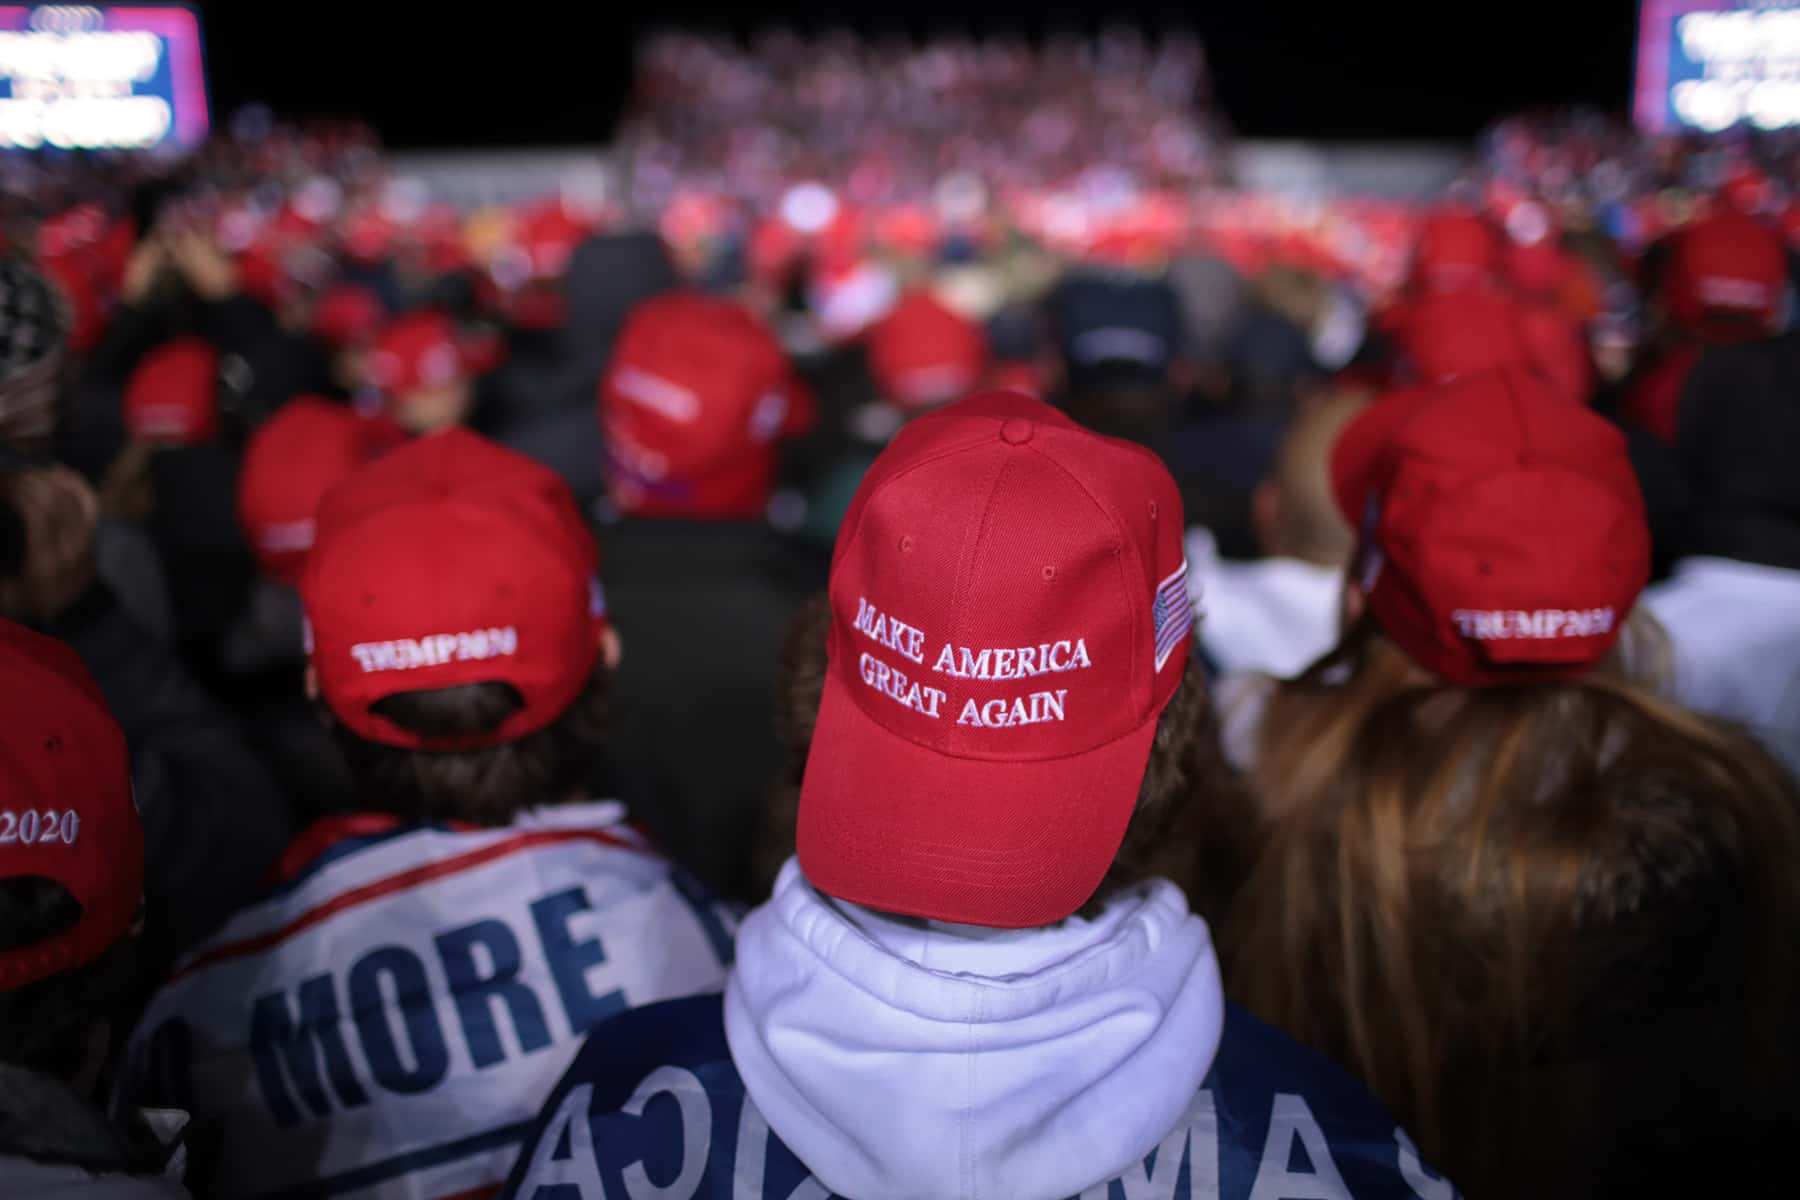 Black President Trump 2020 American Baseball Cap With Leaves MAGA NATIONALIST